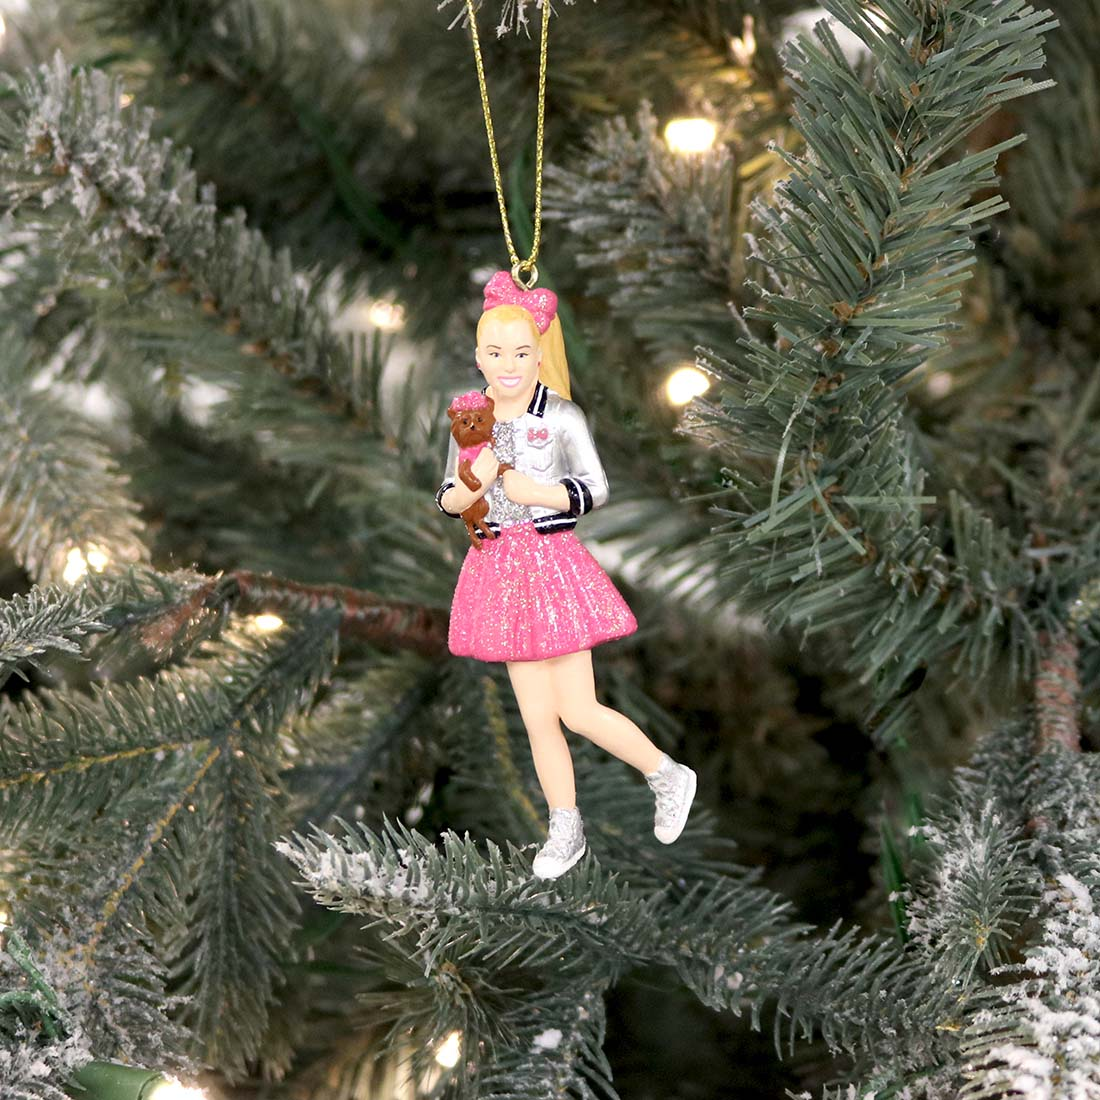 Cracker Barrel Christmas Tree Decorations  from cdn-tp2.mozu.com